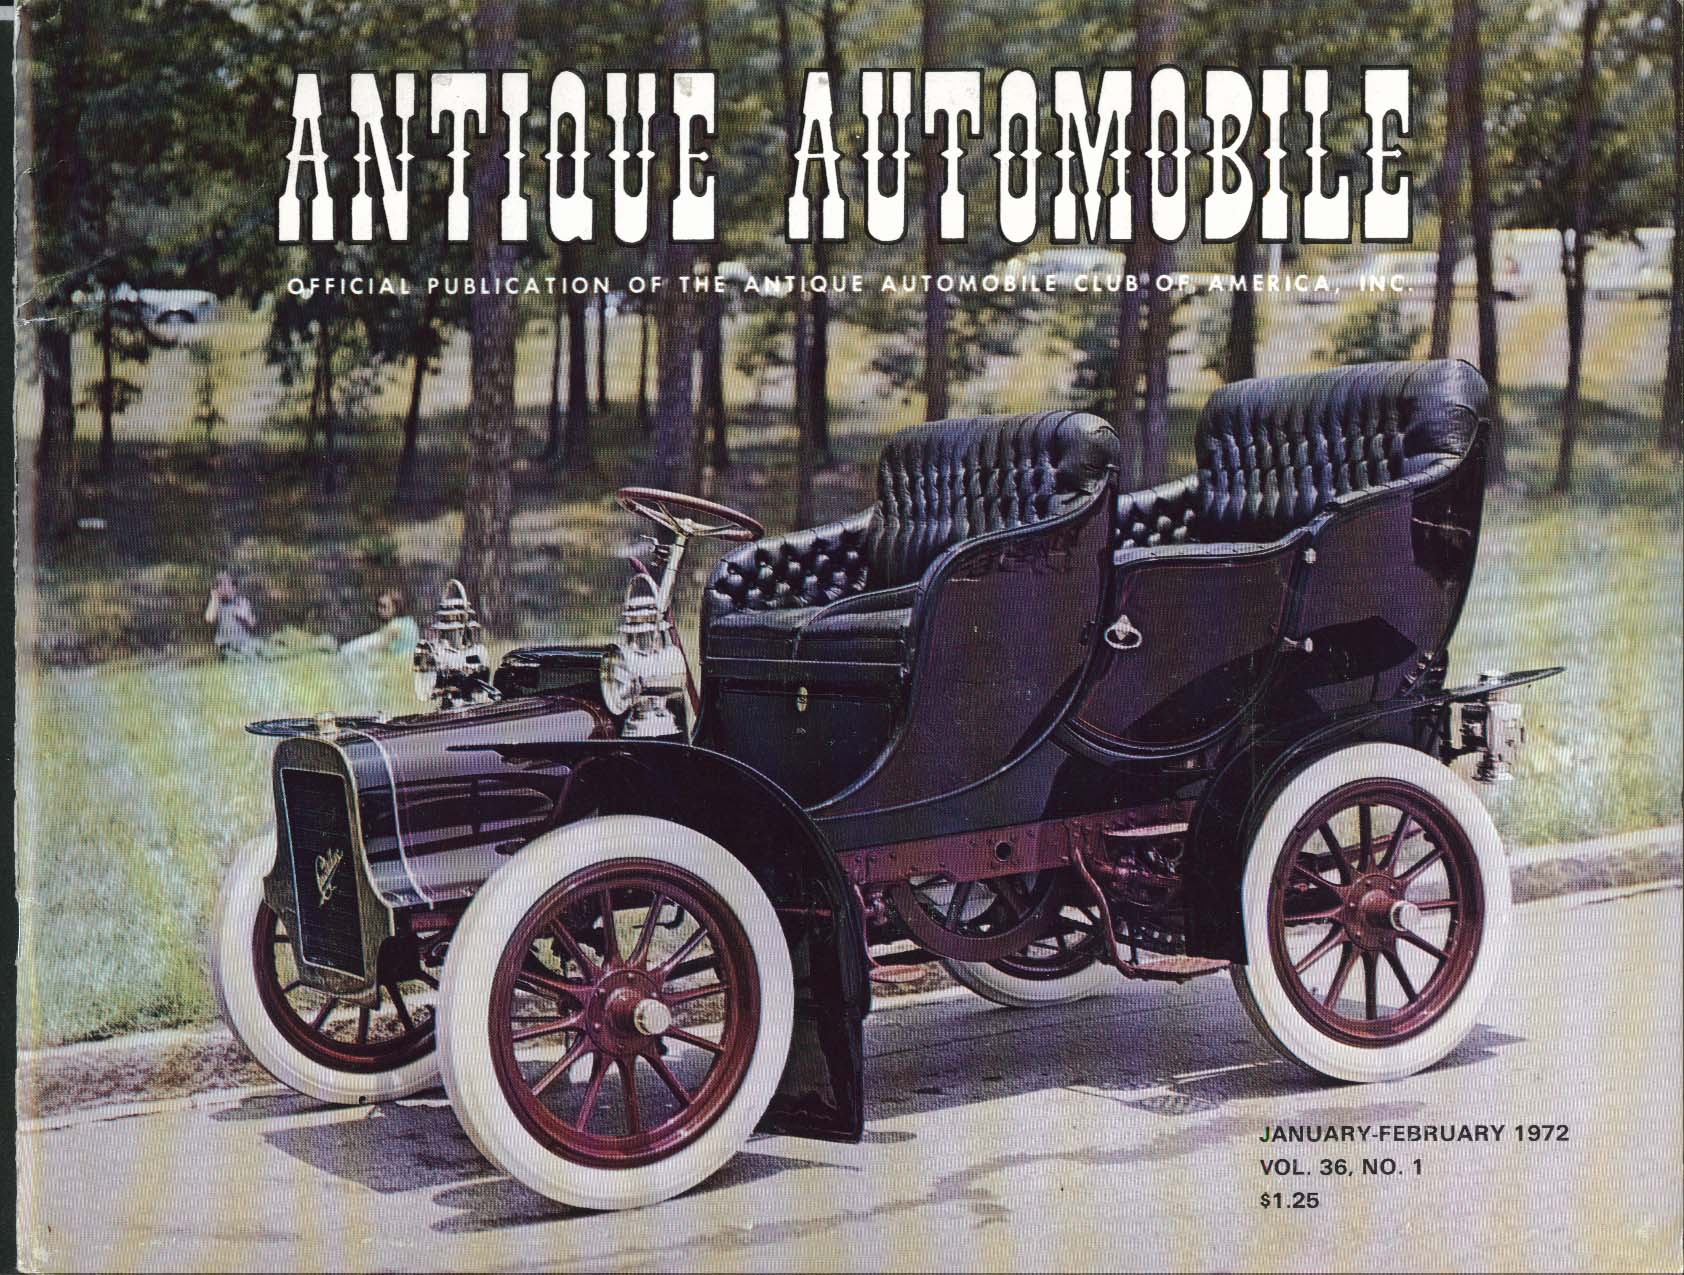 ANTIQUE AUTOMOBILE Glidden Tour Paul Marvel Halladay Ford ++ 1/2 1972